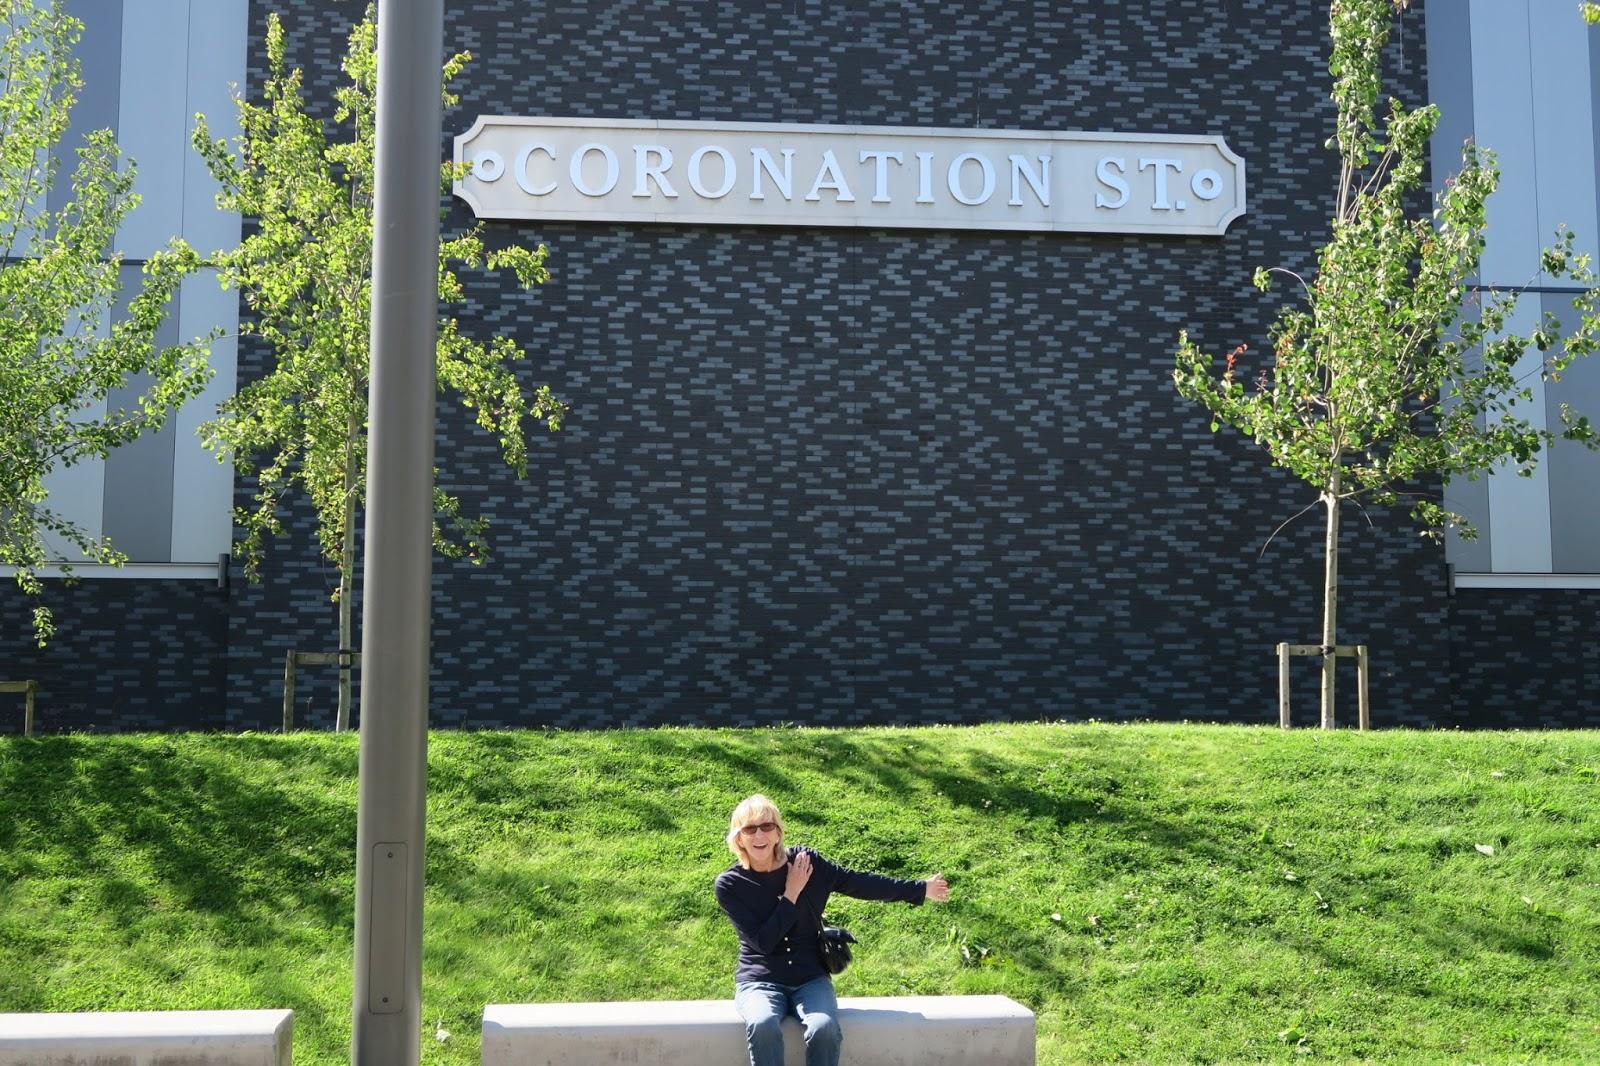 Coronation Street Set, Coronation Street Tours, Manchester, British TV, Salford, MediaCityUK, Manchester,